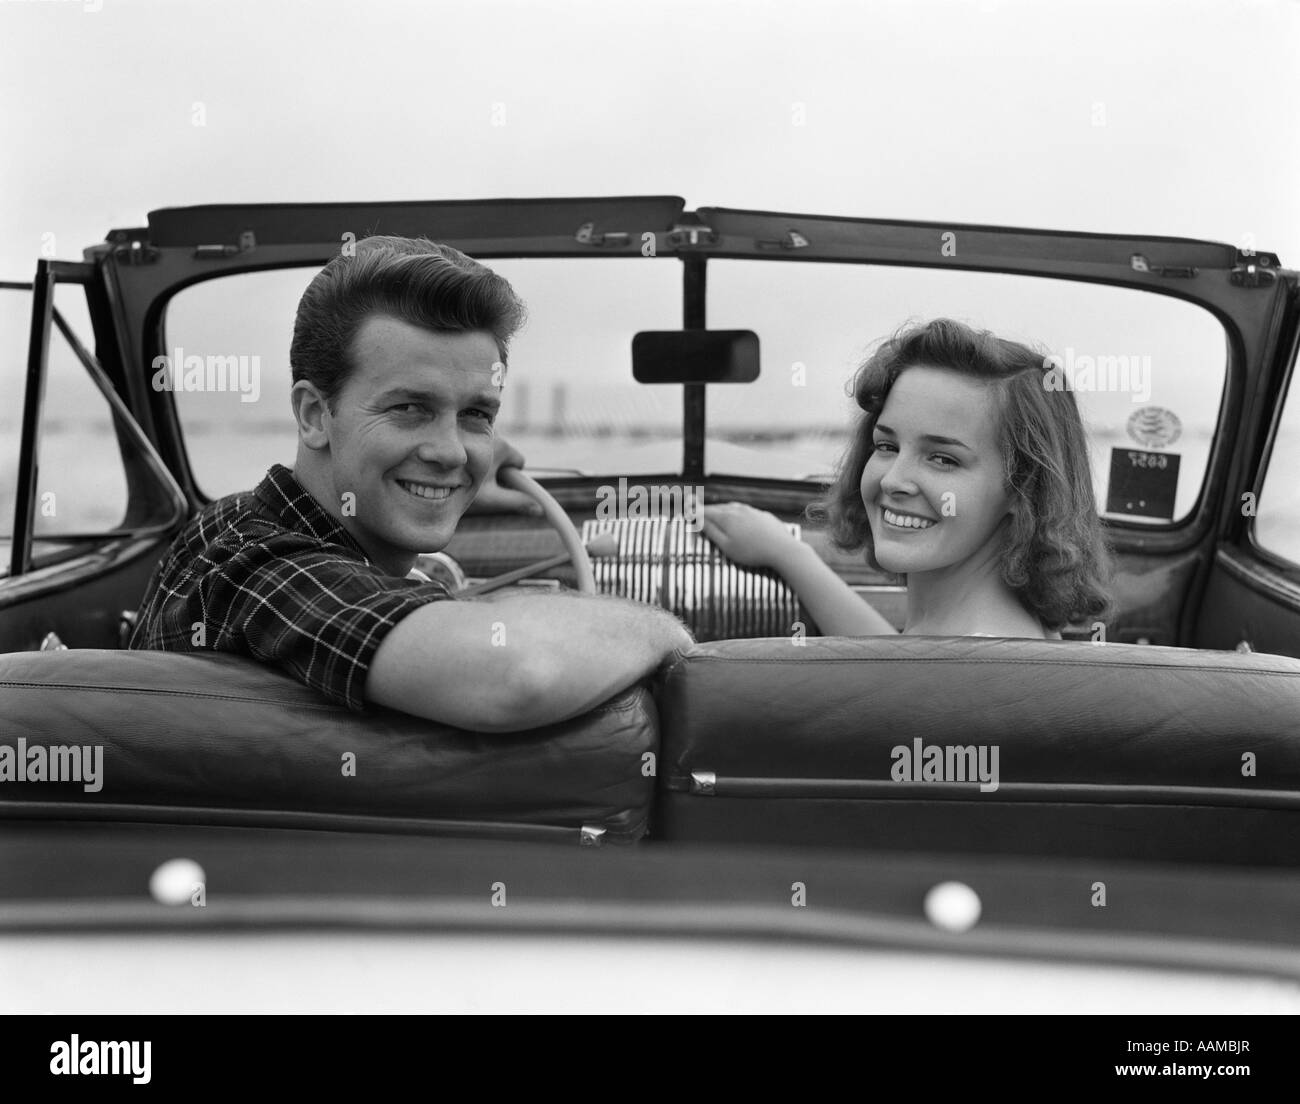 1940s CONVERTIBLE COUPLE MAN WOMAN DATE SMILE CAR